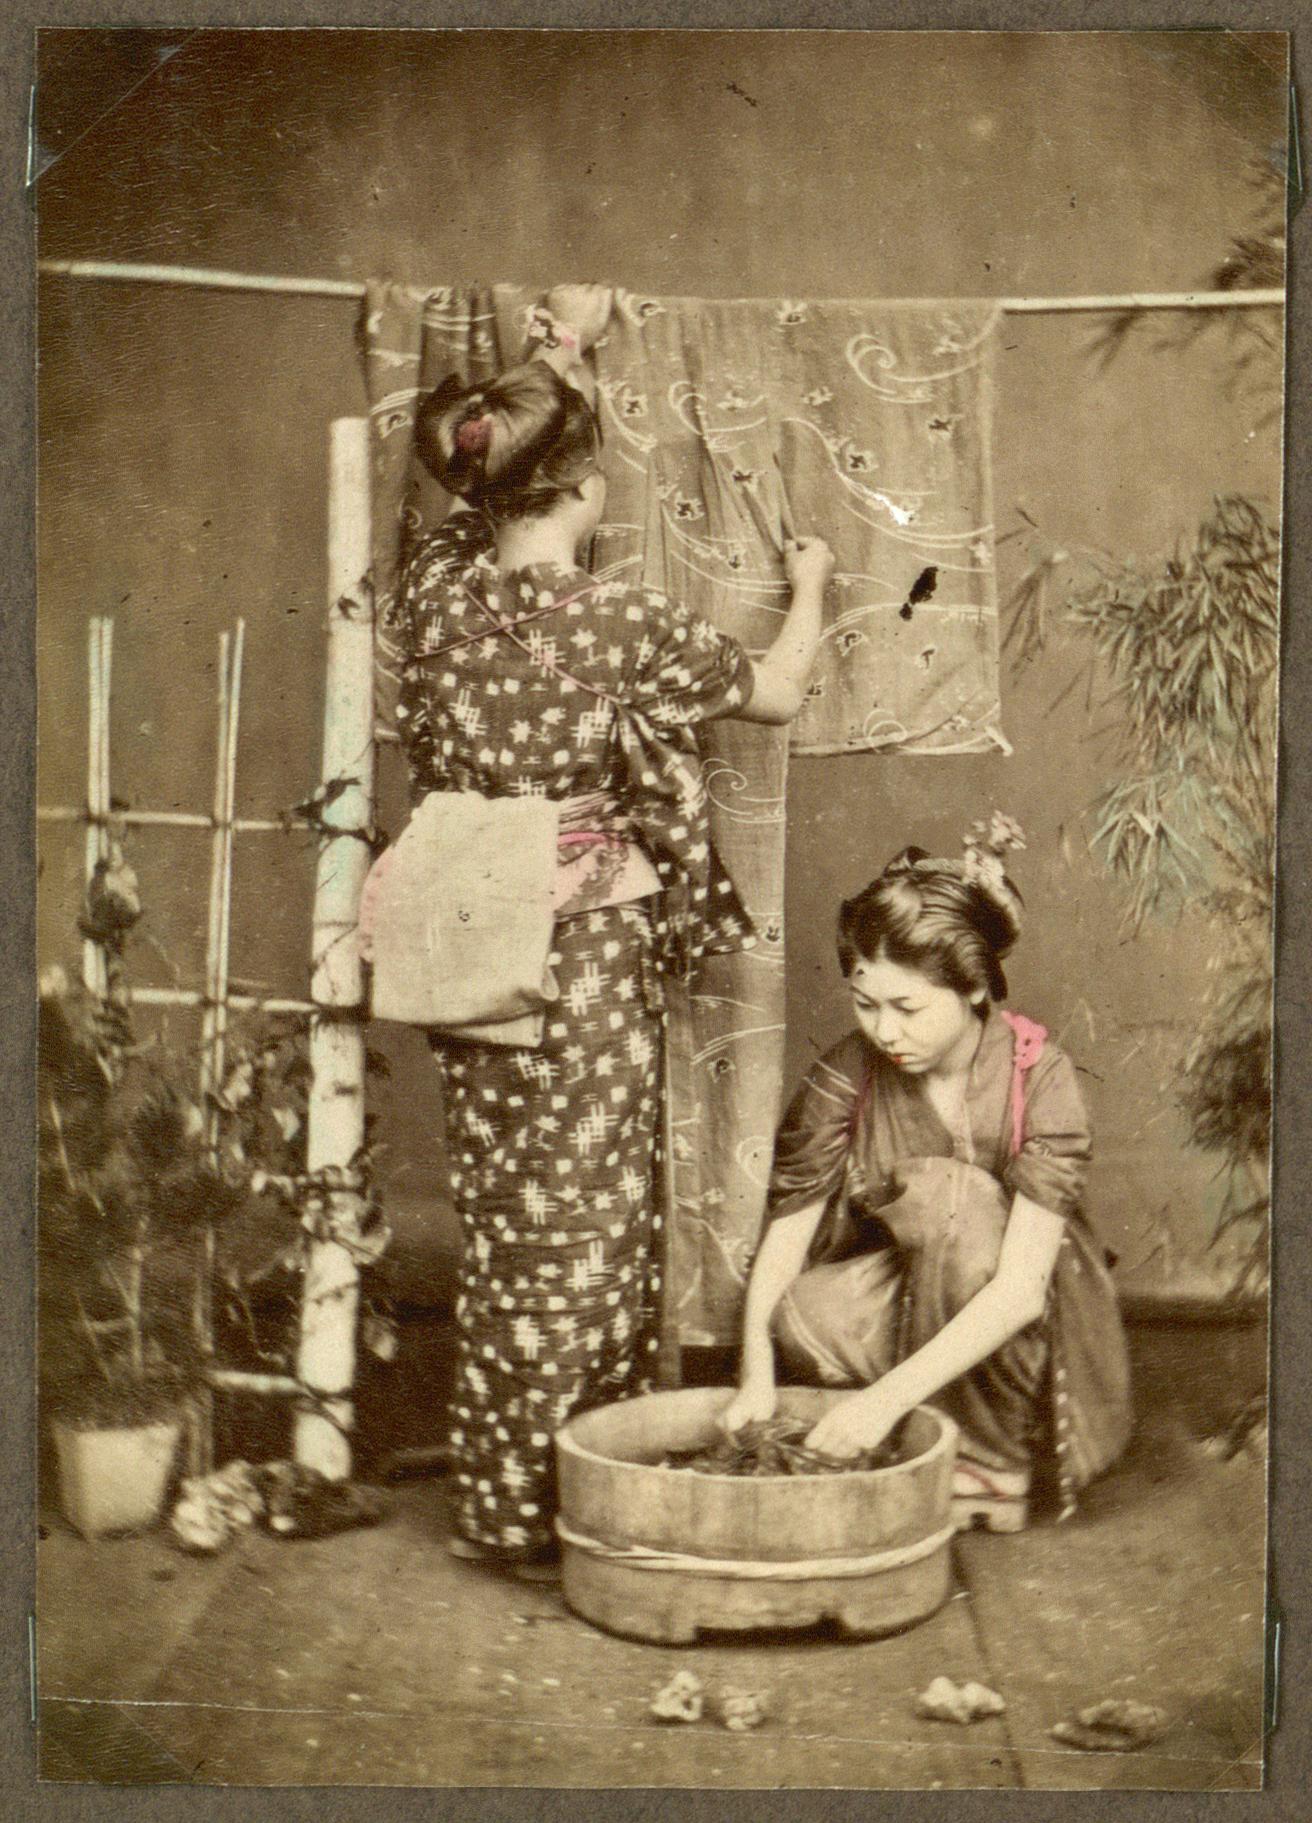 Japanese_women_wash_clothes,_Japan__(10796577693)